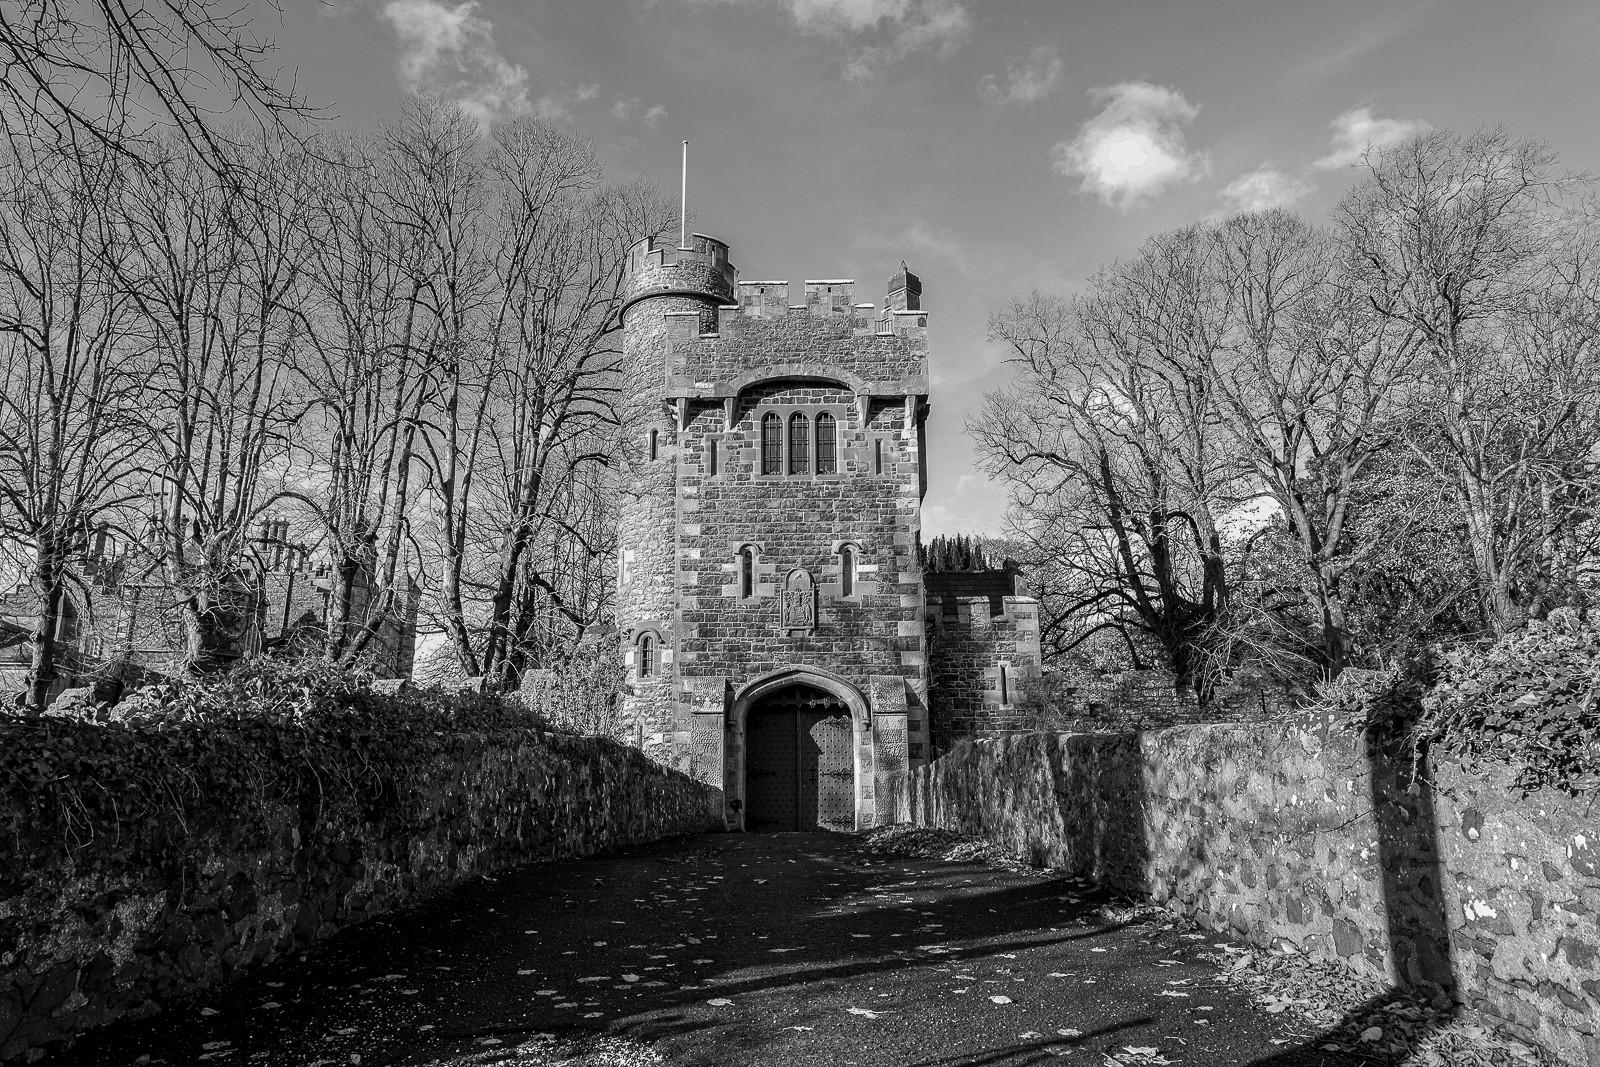 MONO - Glenarm Gate by Derek Kane (8 marks)